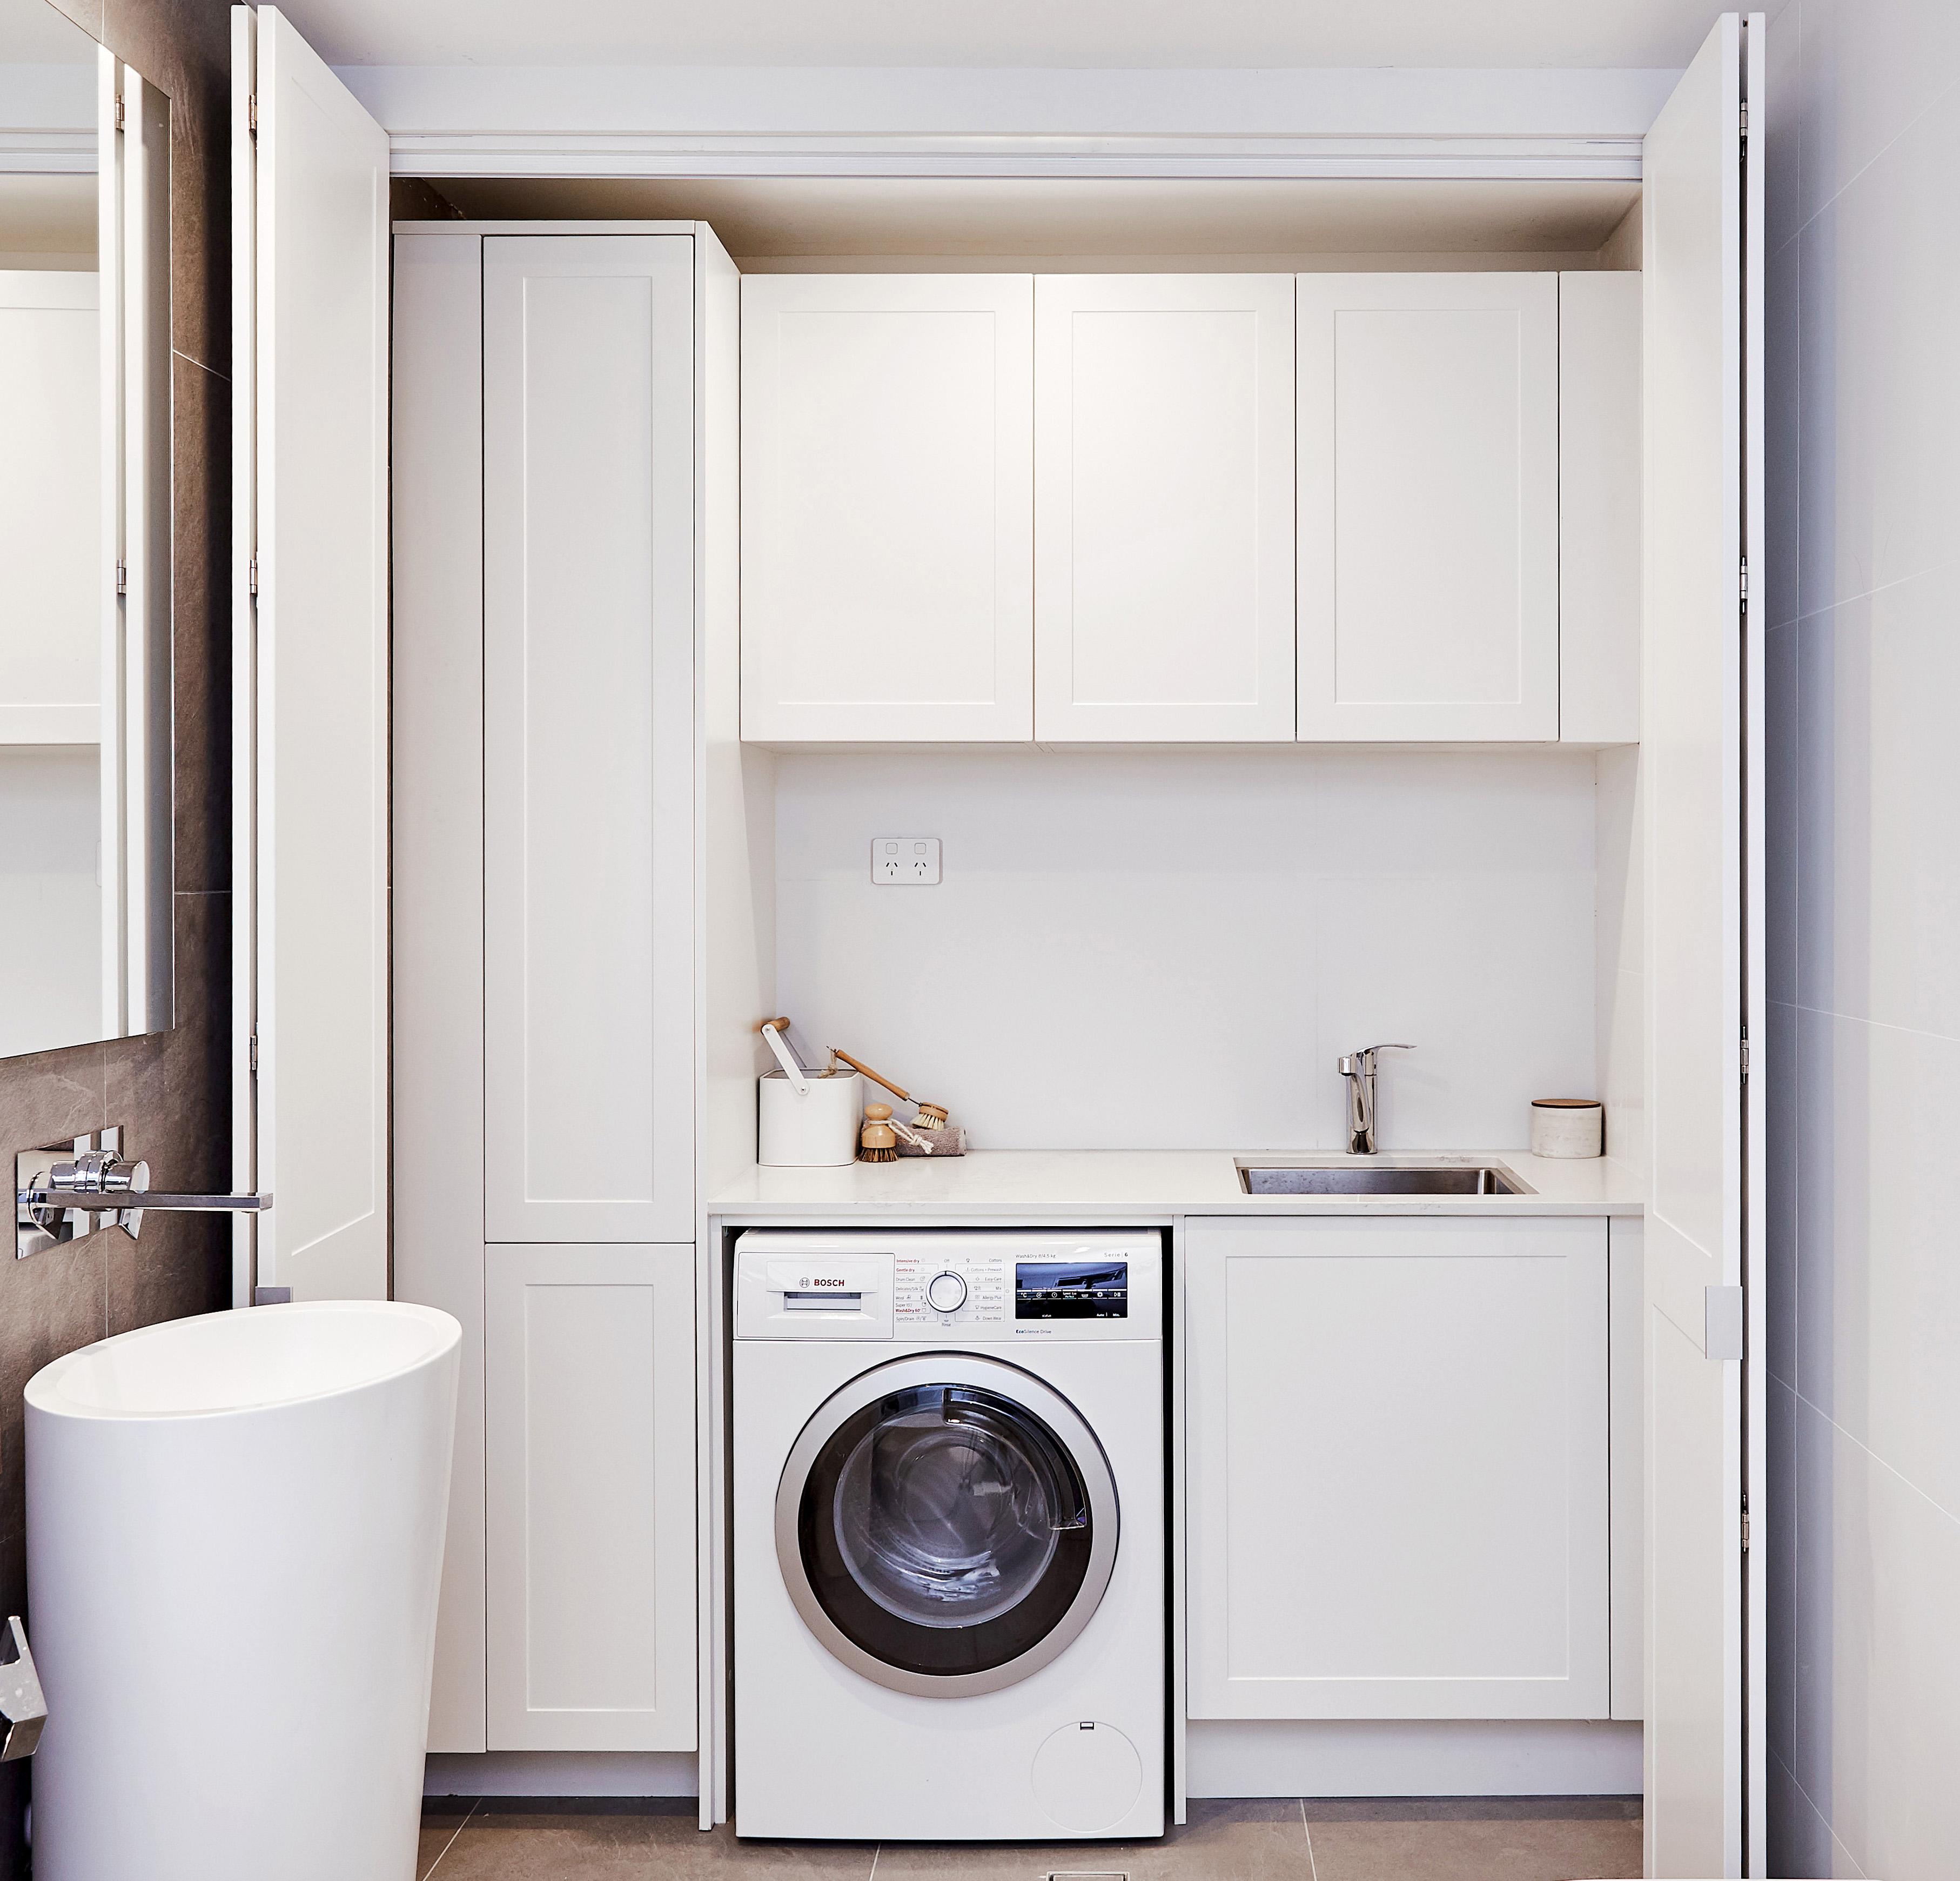 freedom-kitchens-european-laundry-storage